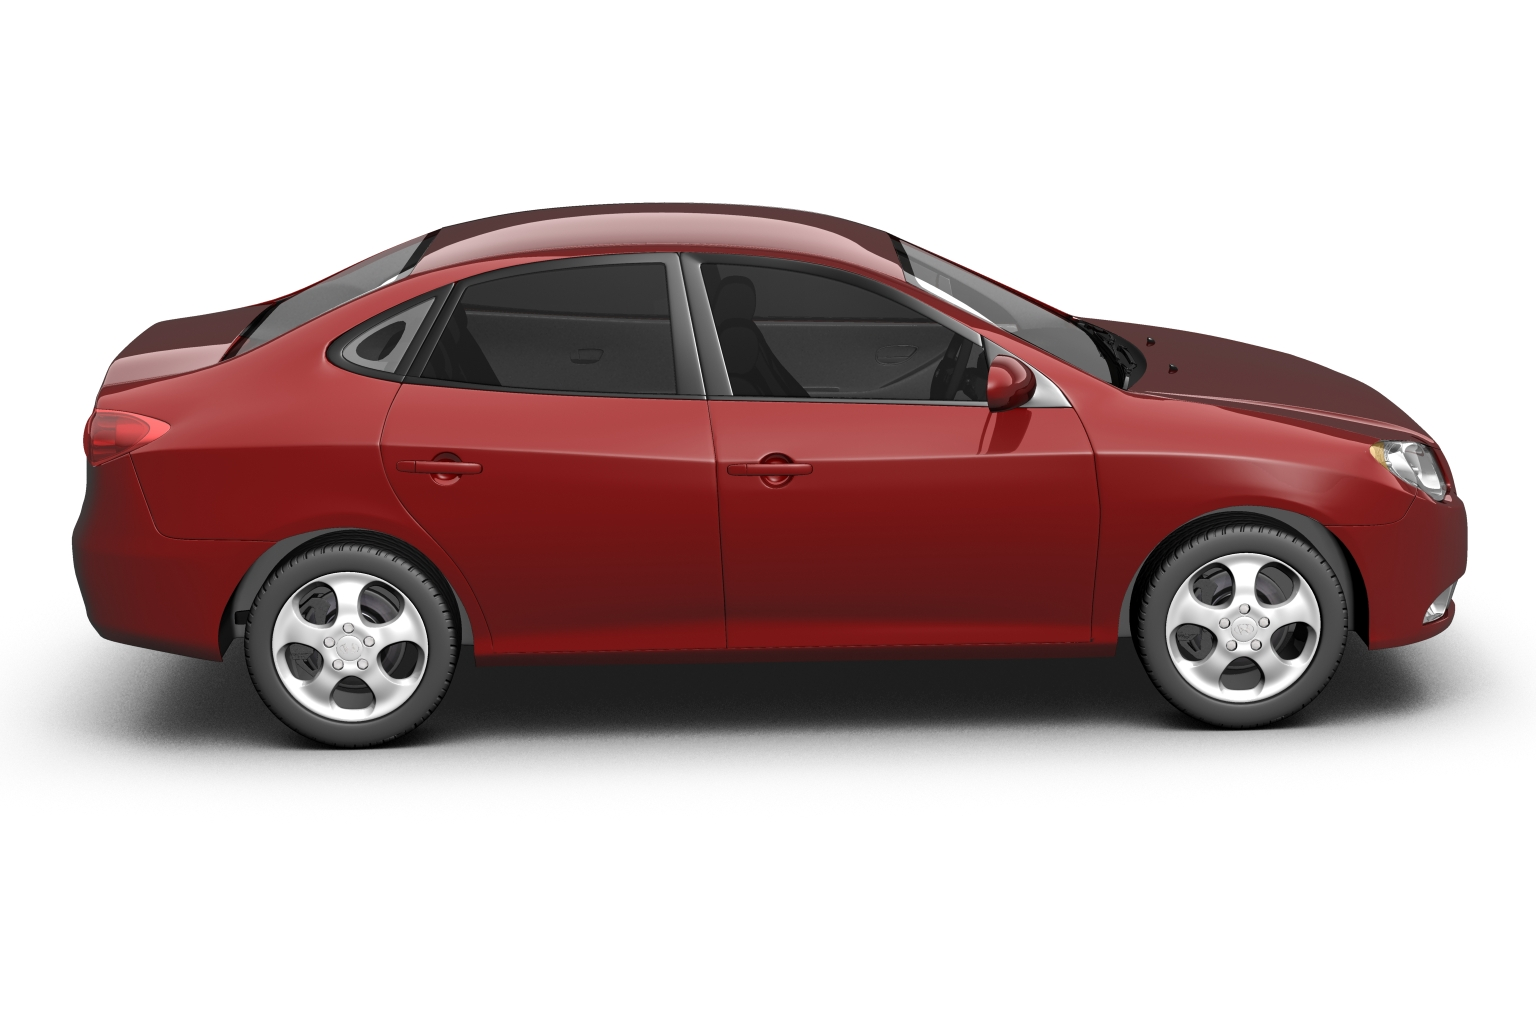 2007 hyundai elantra (avante) Model 3d 3ds max fbx lwo hrc xsi obj 205407